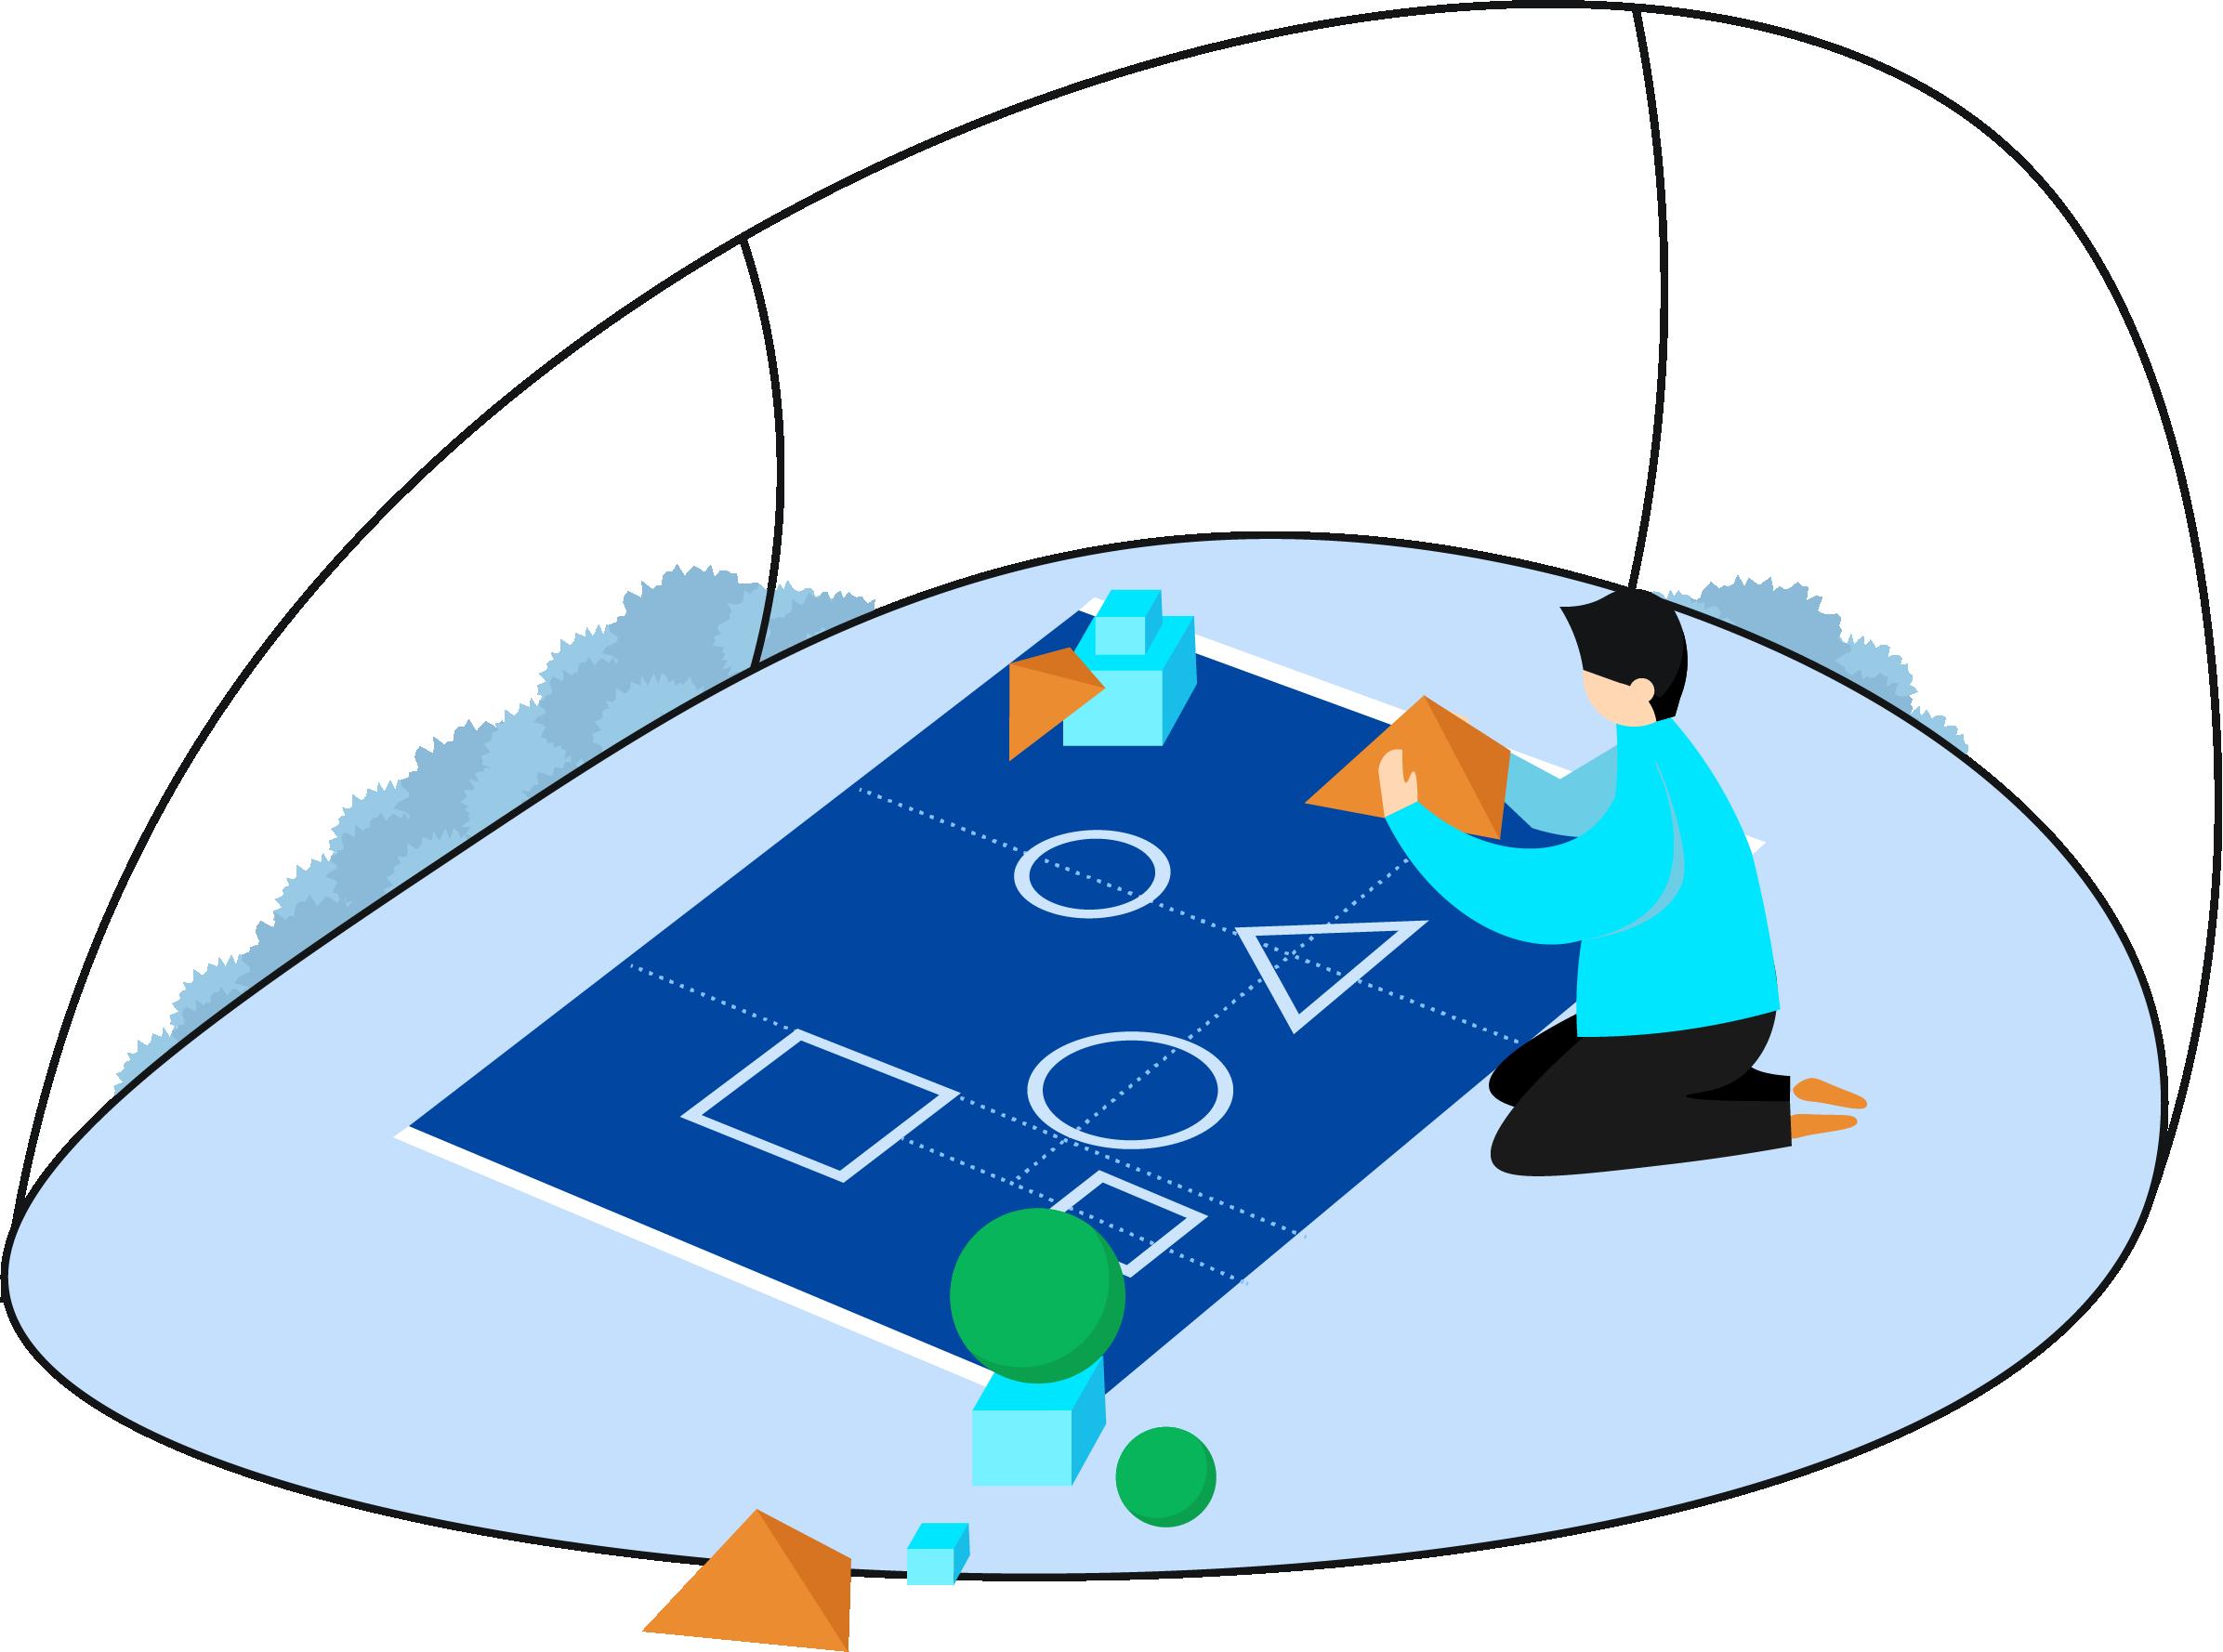 Creating an Impact Map